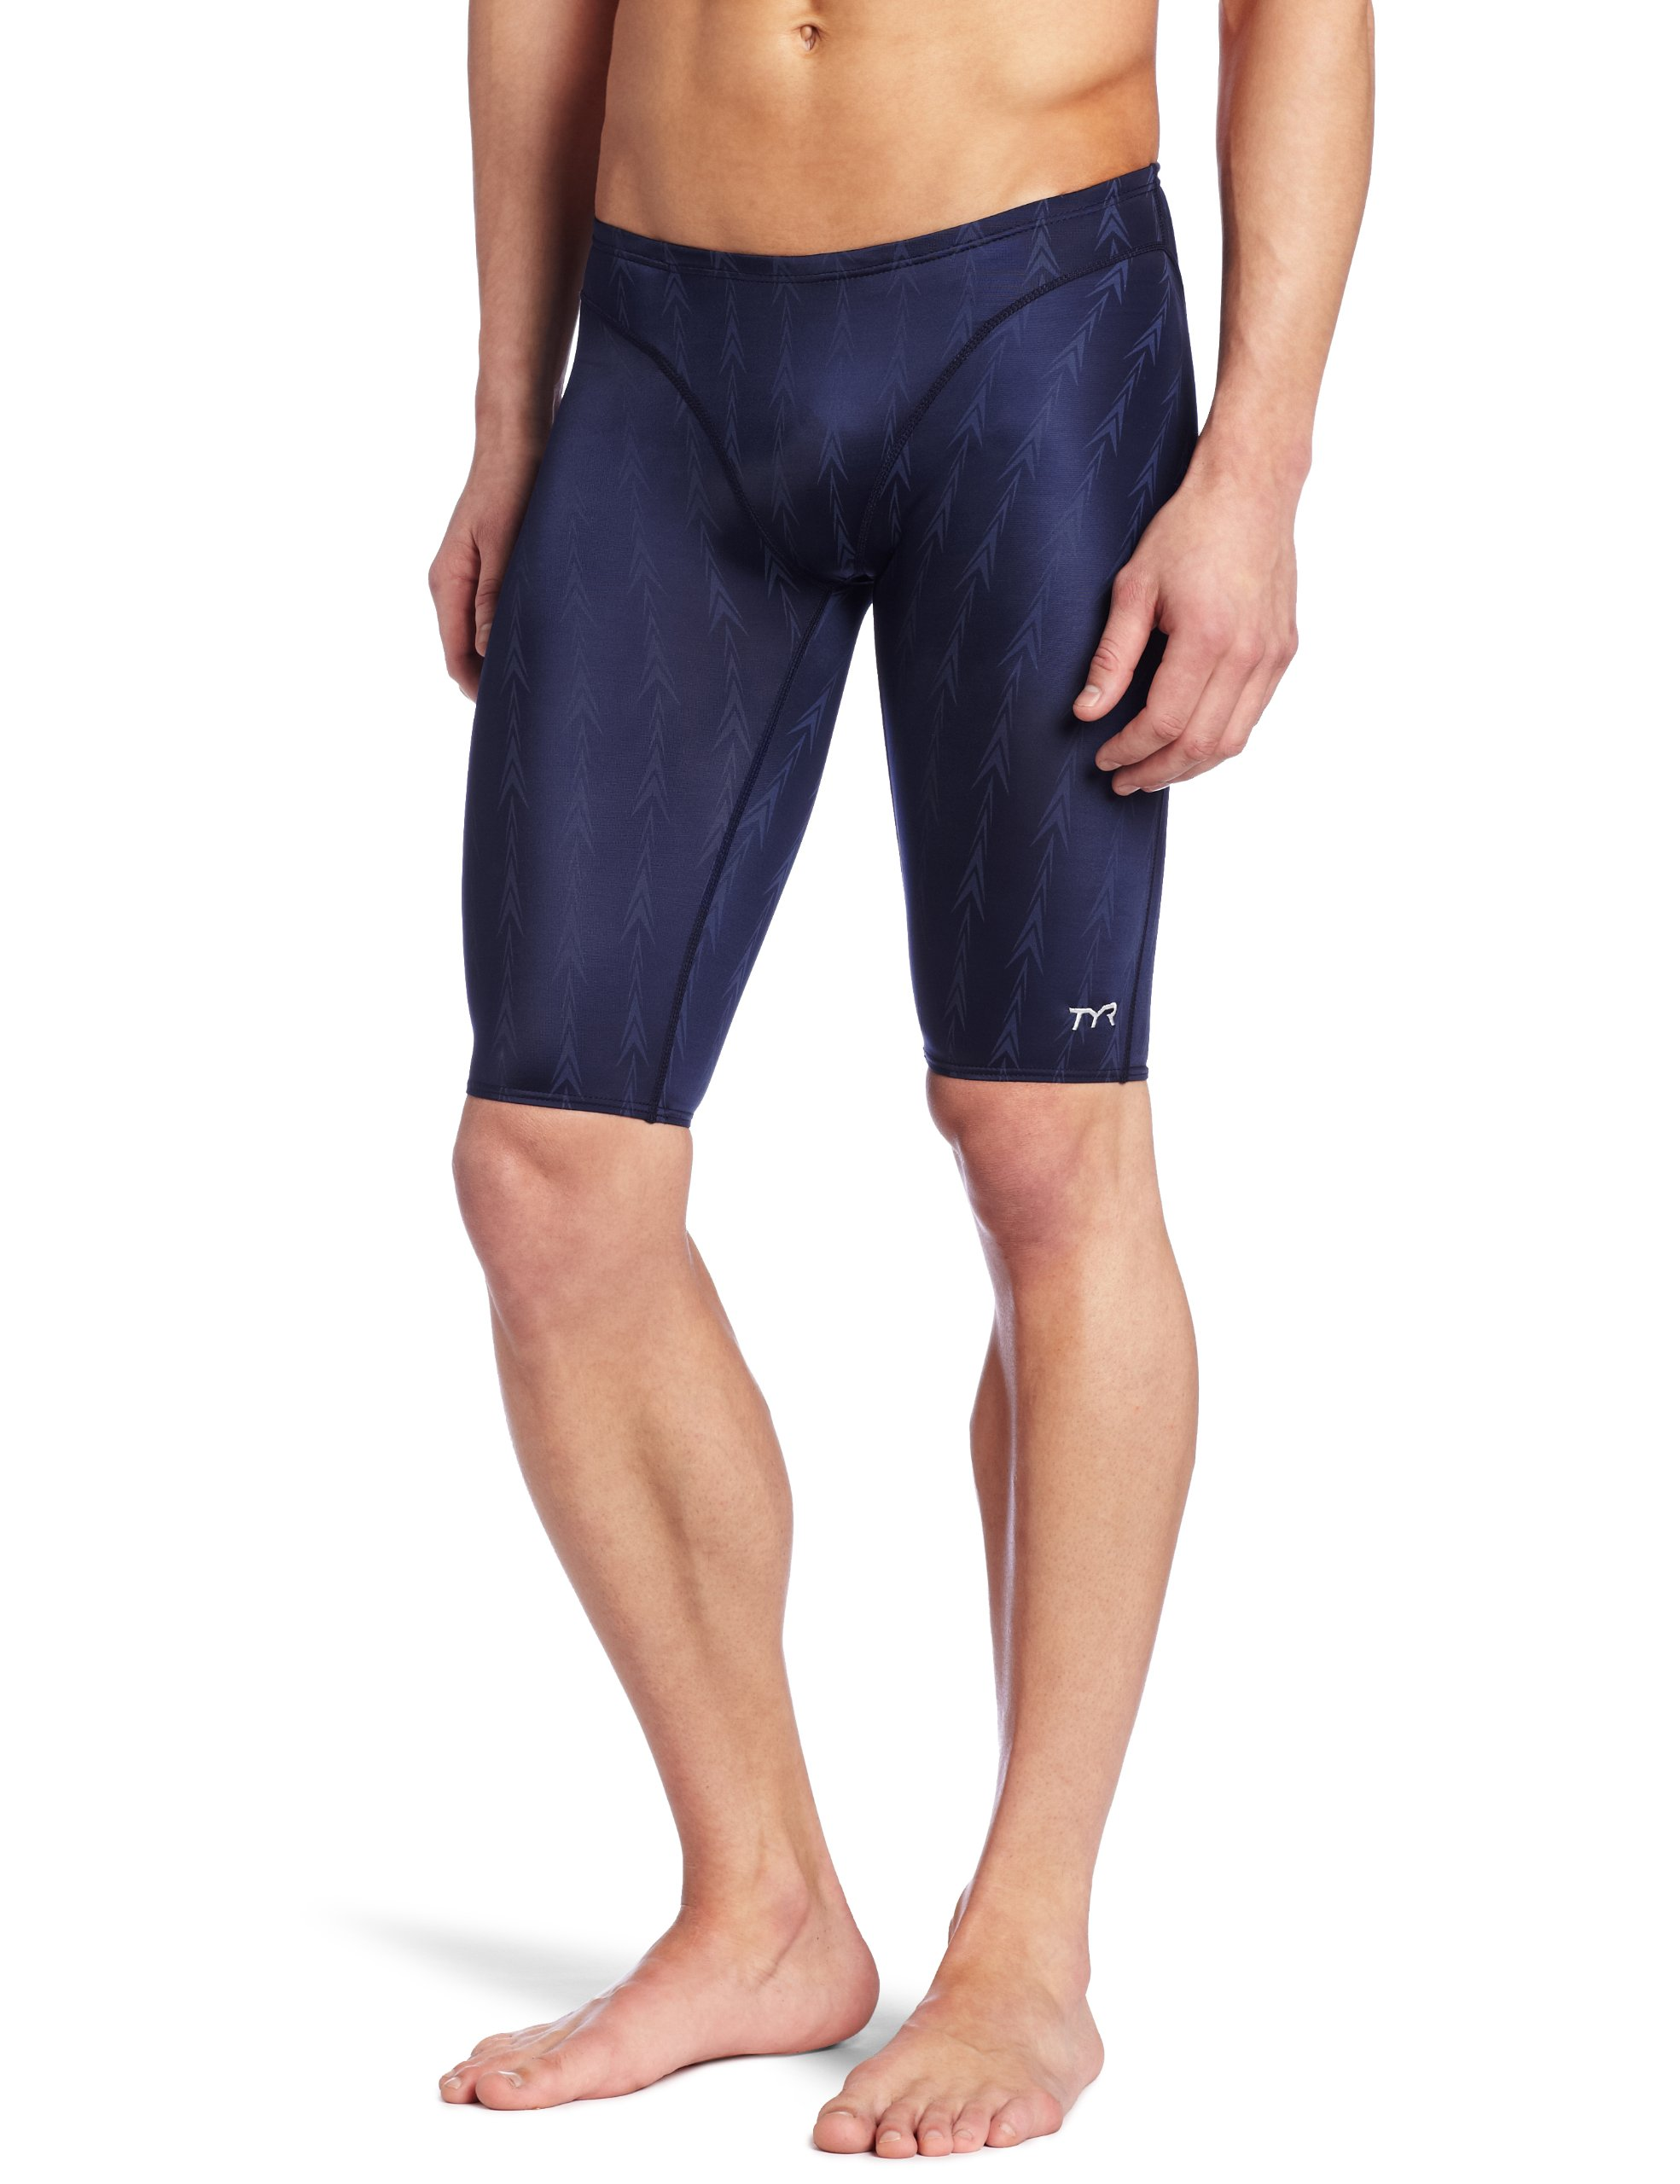 TYR Men's Fusion 2 Jammer Swim Suit (Navy, 30 -Inch)